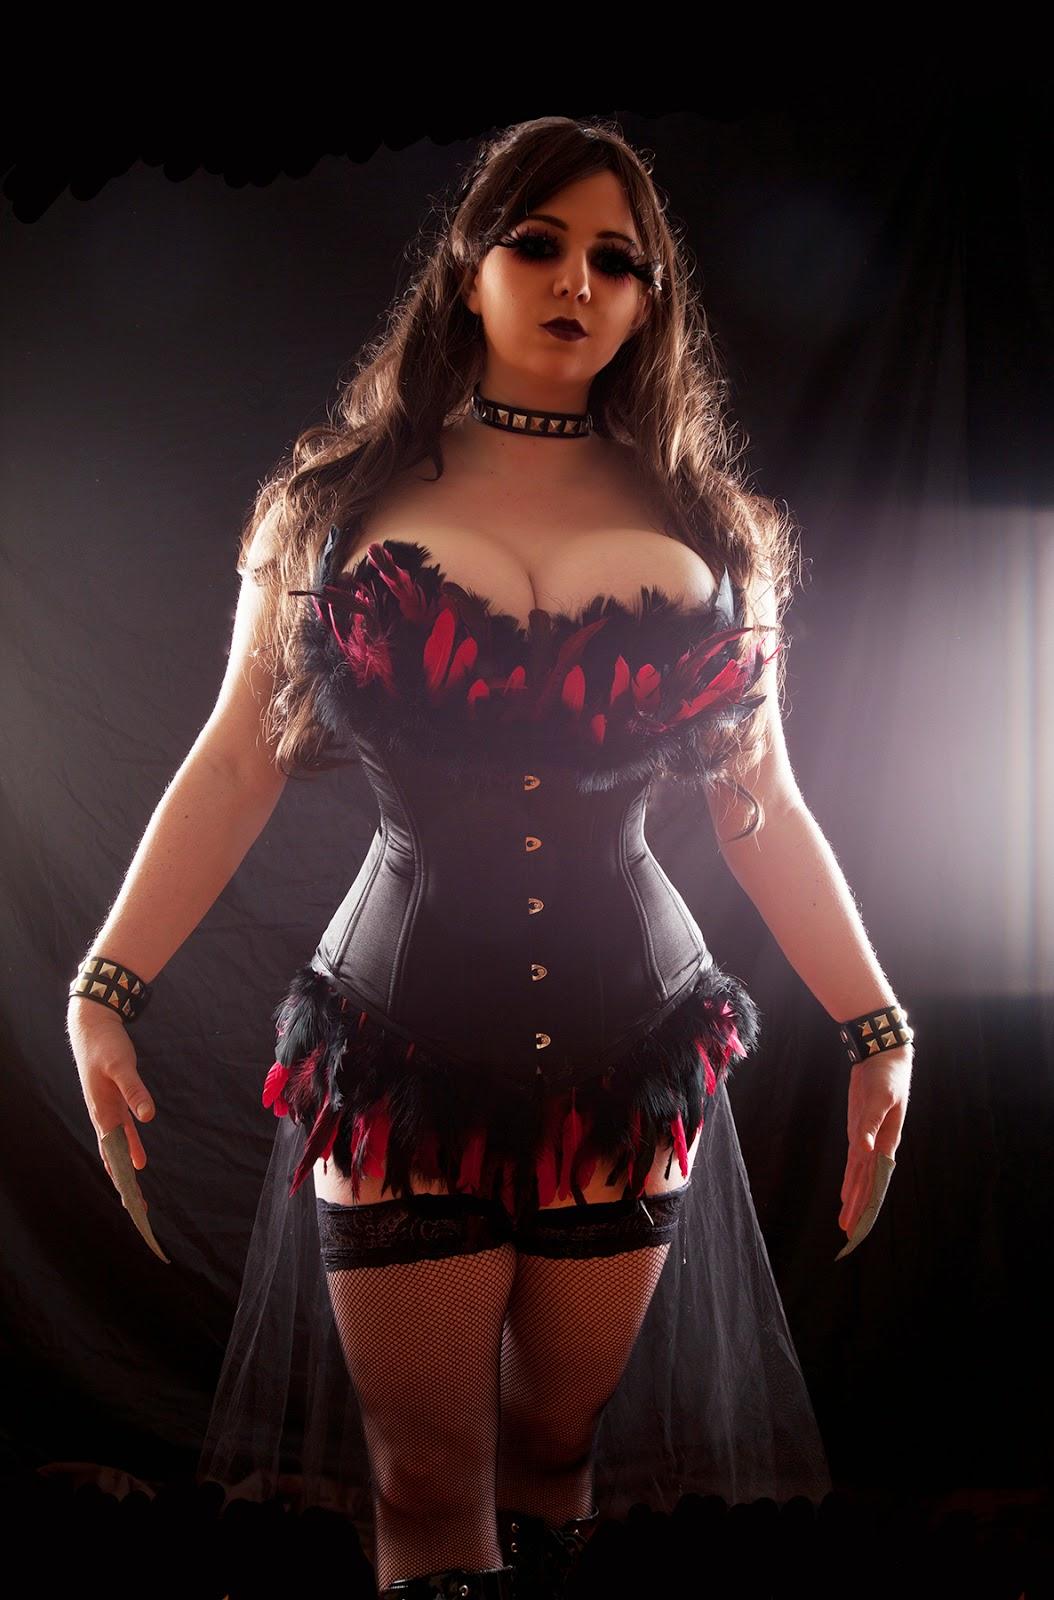 femme voluptueuse en corset style burlesque